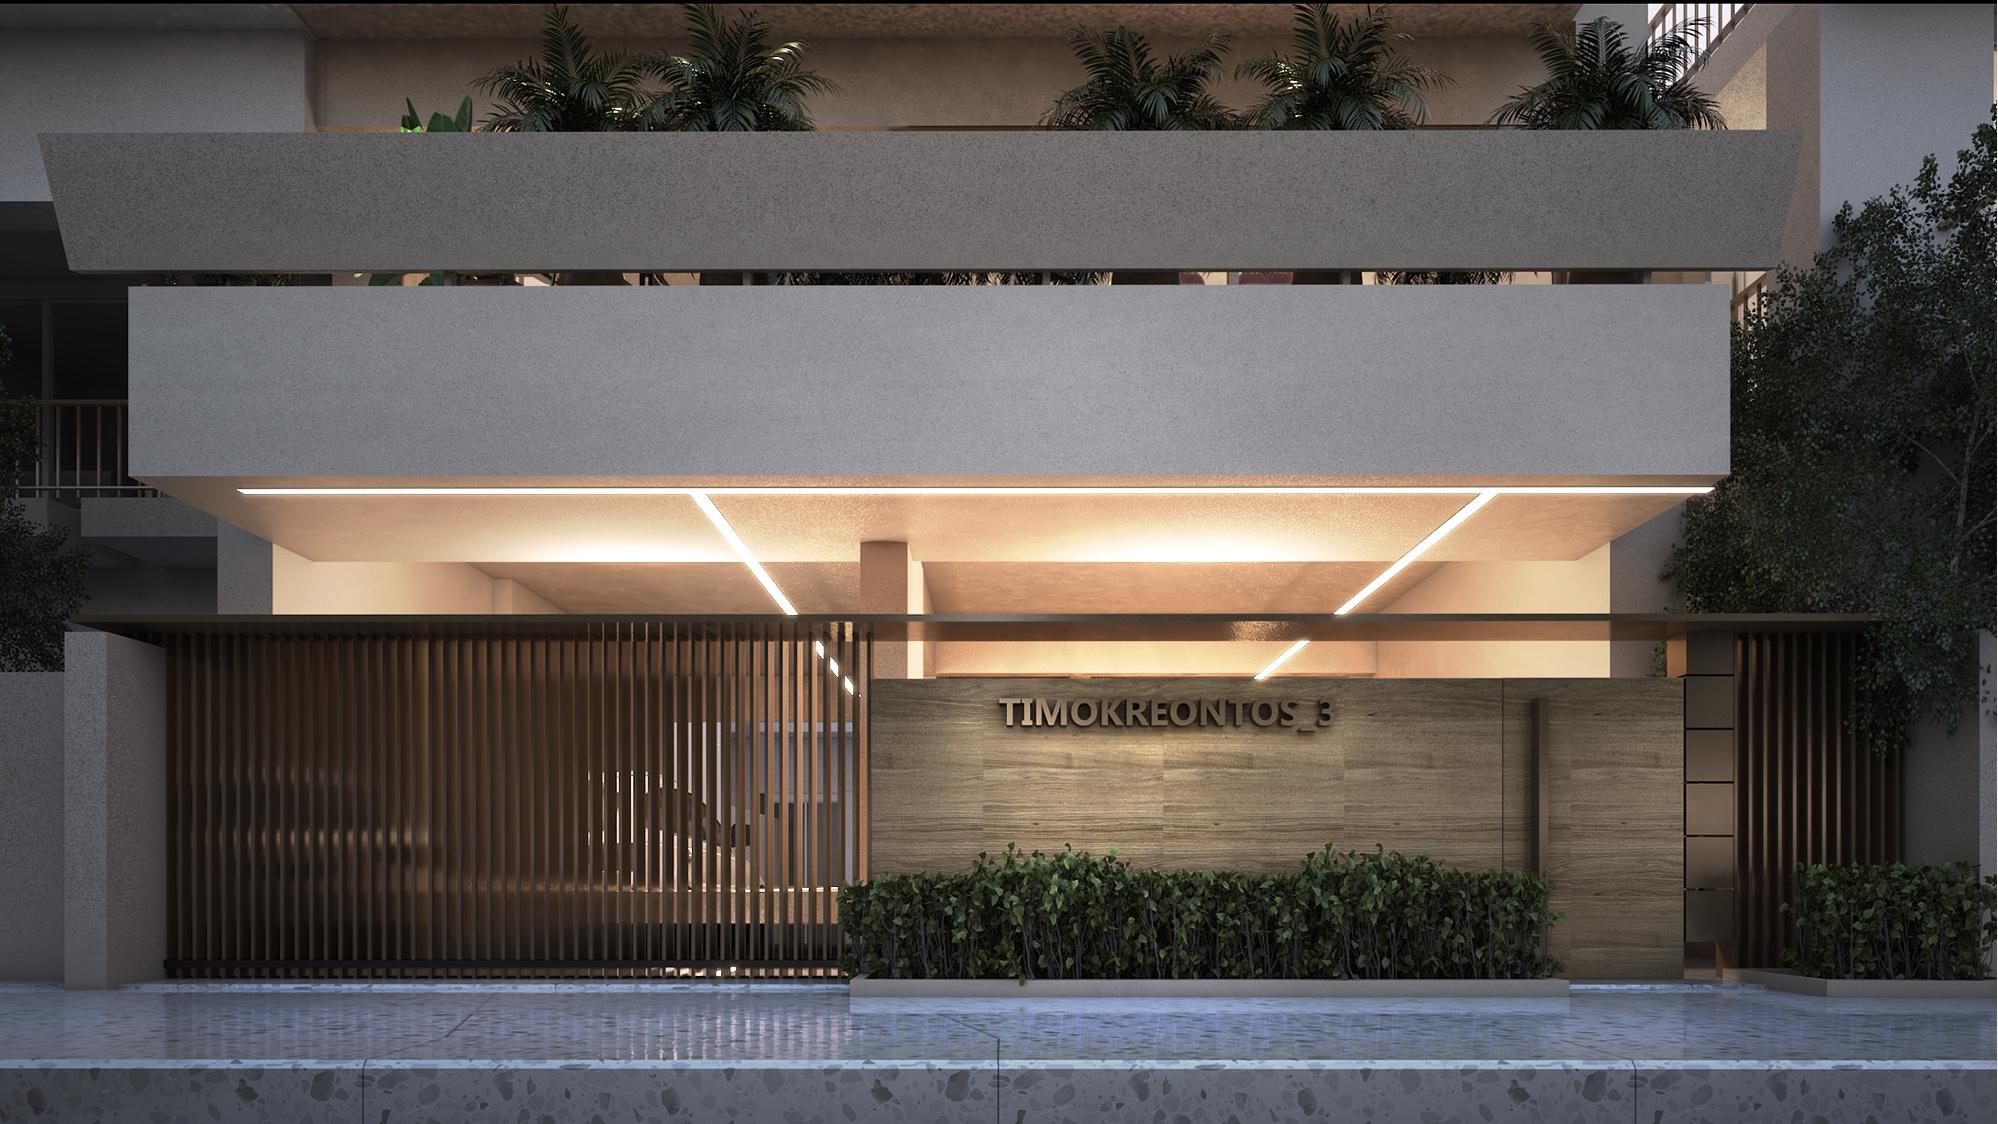 Timokreontos 3